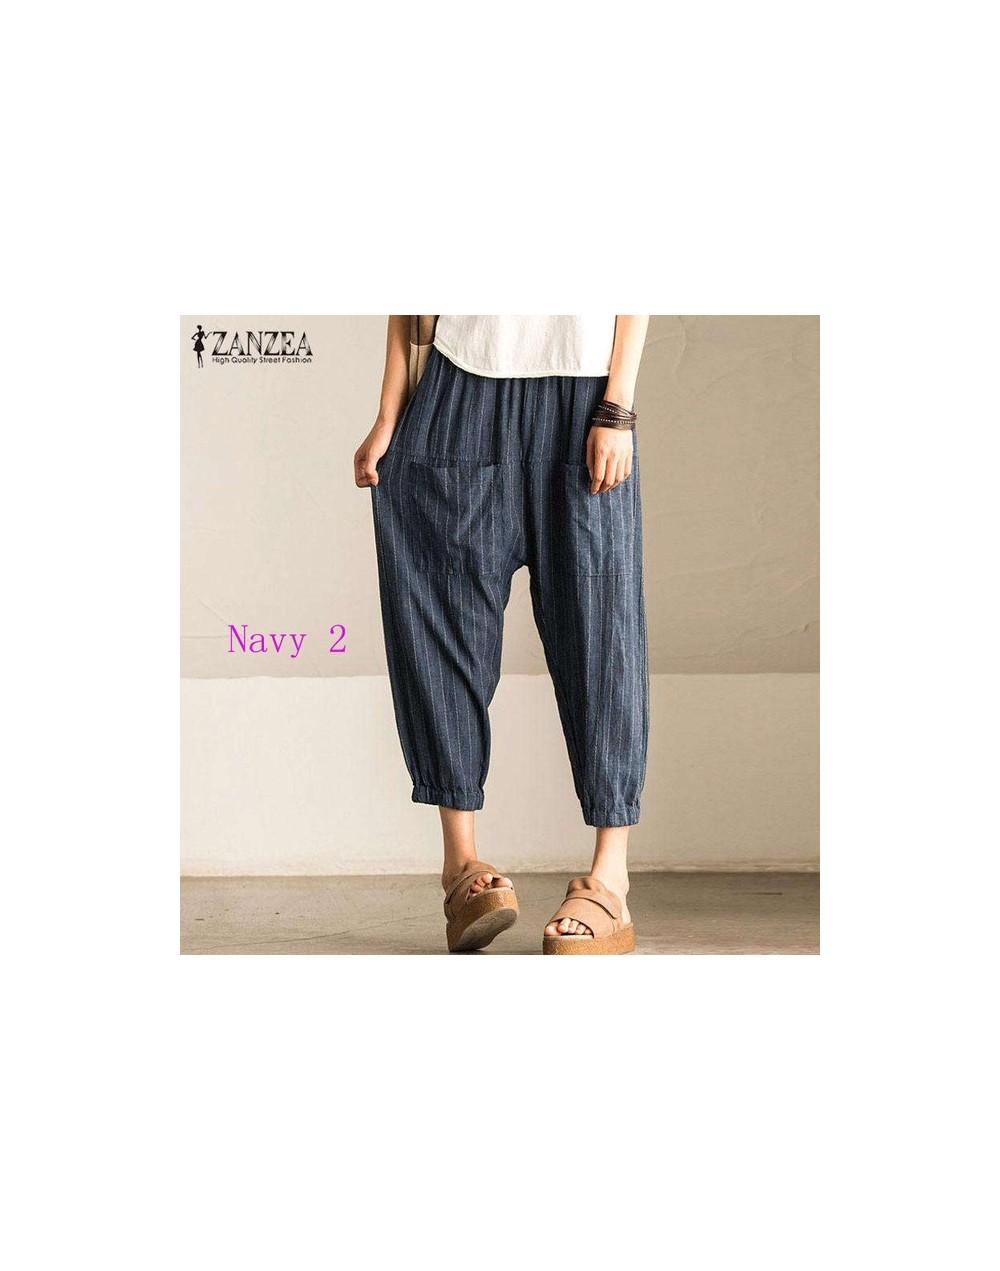 5xl Autumn Striped Pants Women Casual Baggy Pant Turnip Long Pantalon Palazzo Lady Elastic Waist Harem Pants Plus Size Navy 2 4c3066701886 3